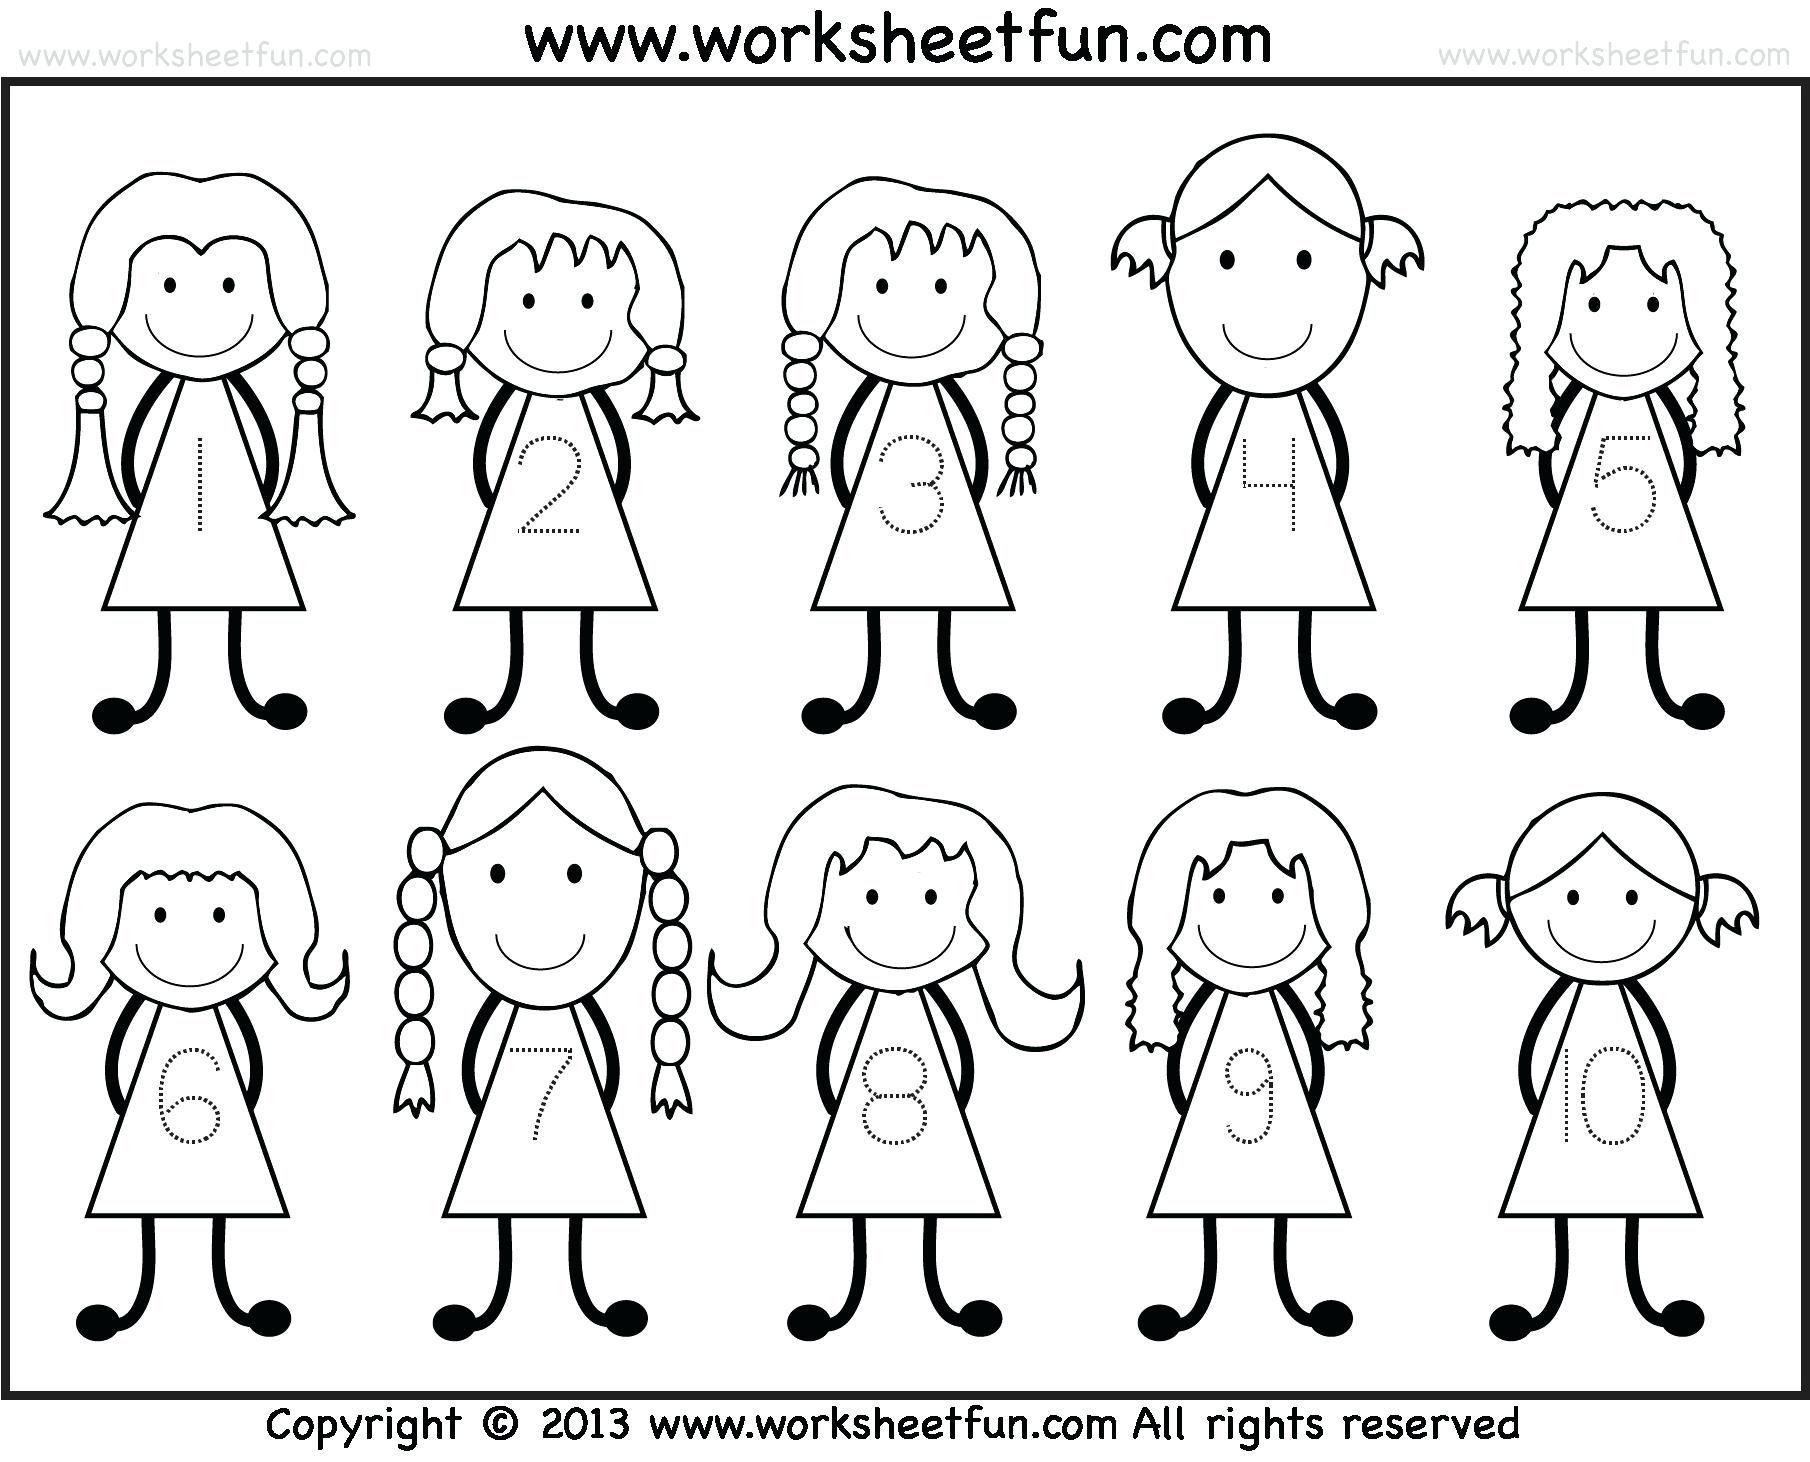 Free Number Tracing Worksheets 1 10 Download Number